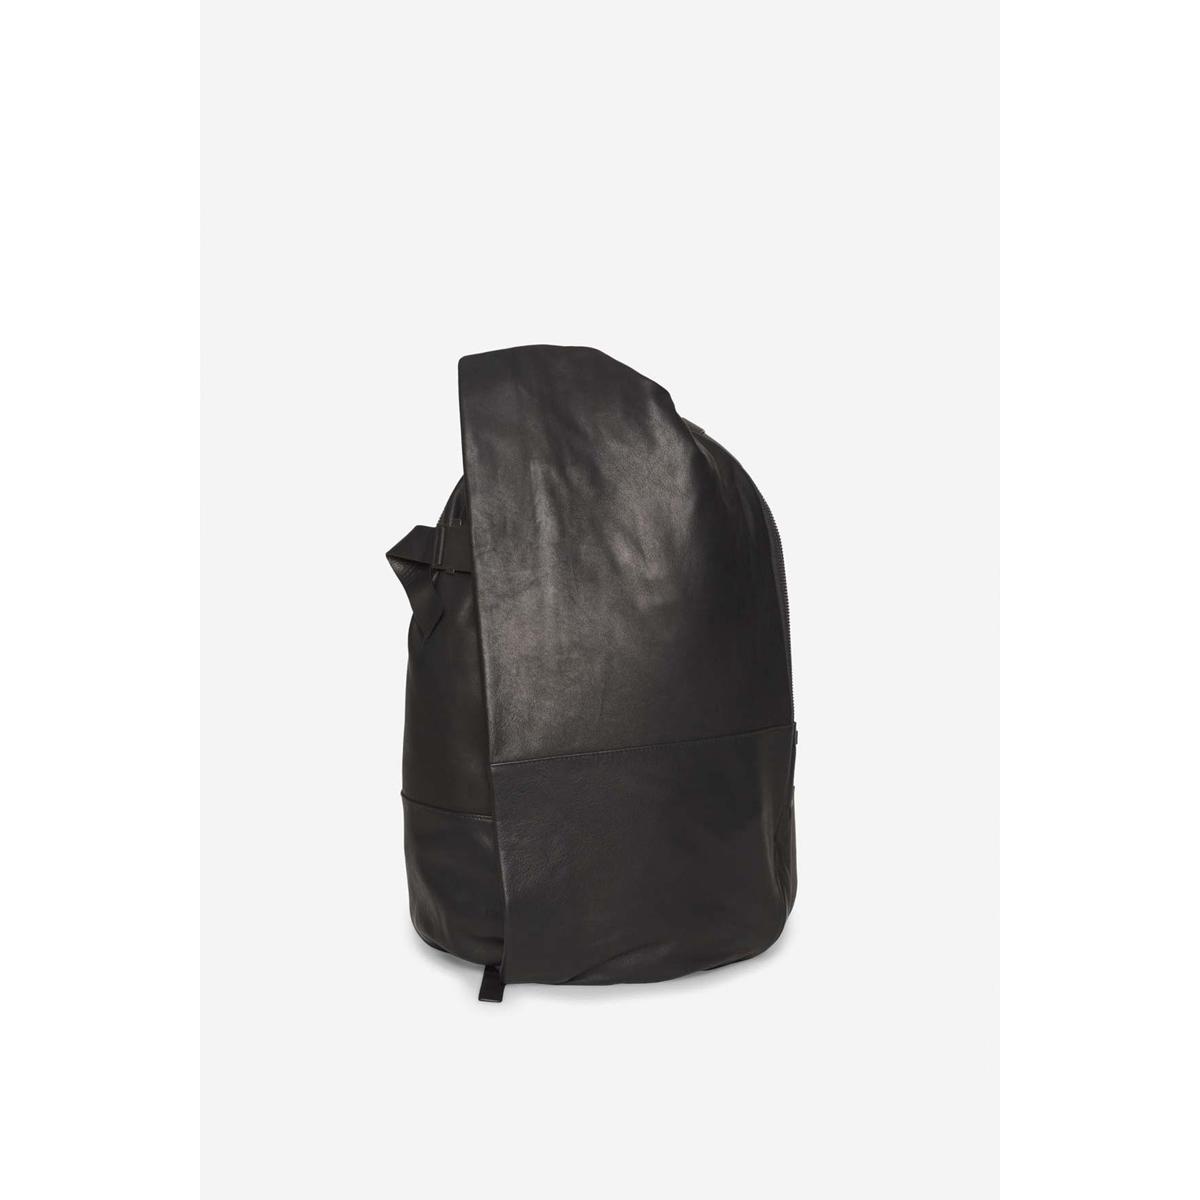 cote&ciel コートエシエル Isar Medium Alias Cowhile Leather Agate Black バックパック リュック 通勤 PC収納 コートアンドシエル コートシエル